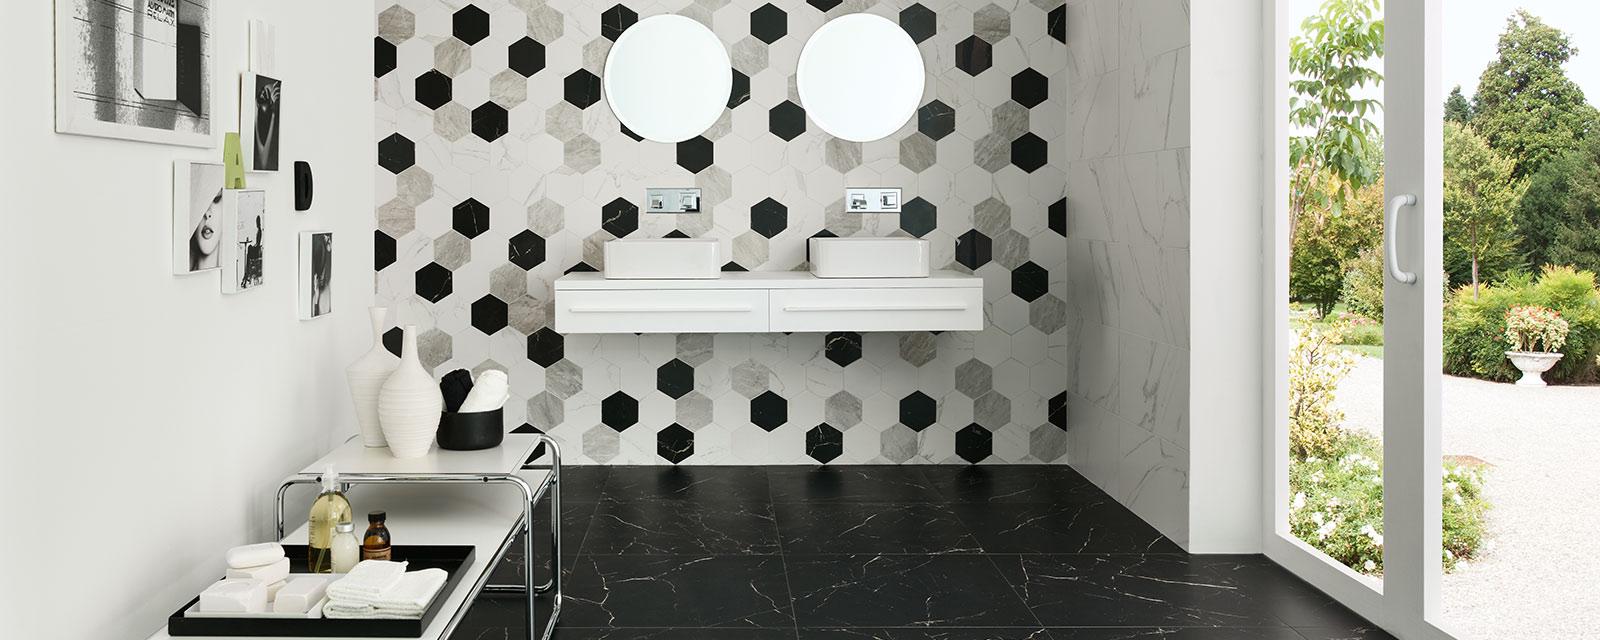 Carrelage Hexagonal Dans La Salle De Bains Guide Artisan